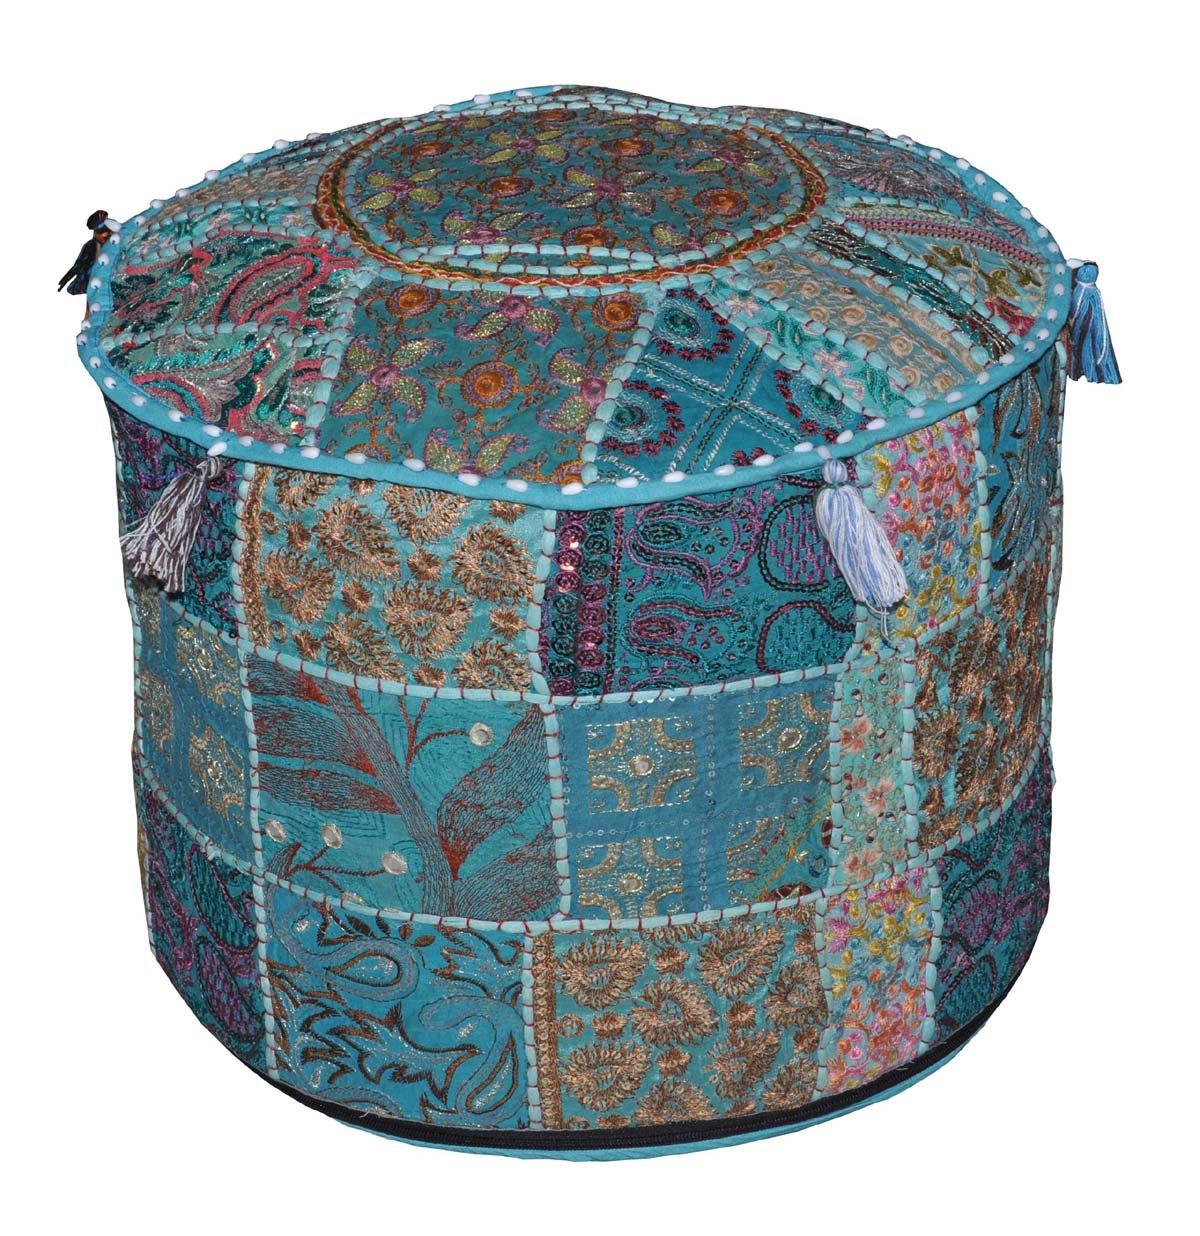 Vintage Indian Embroidery Round Cushion Ottoman Stool Pouf